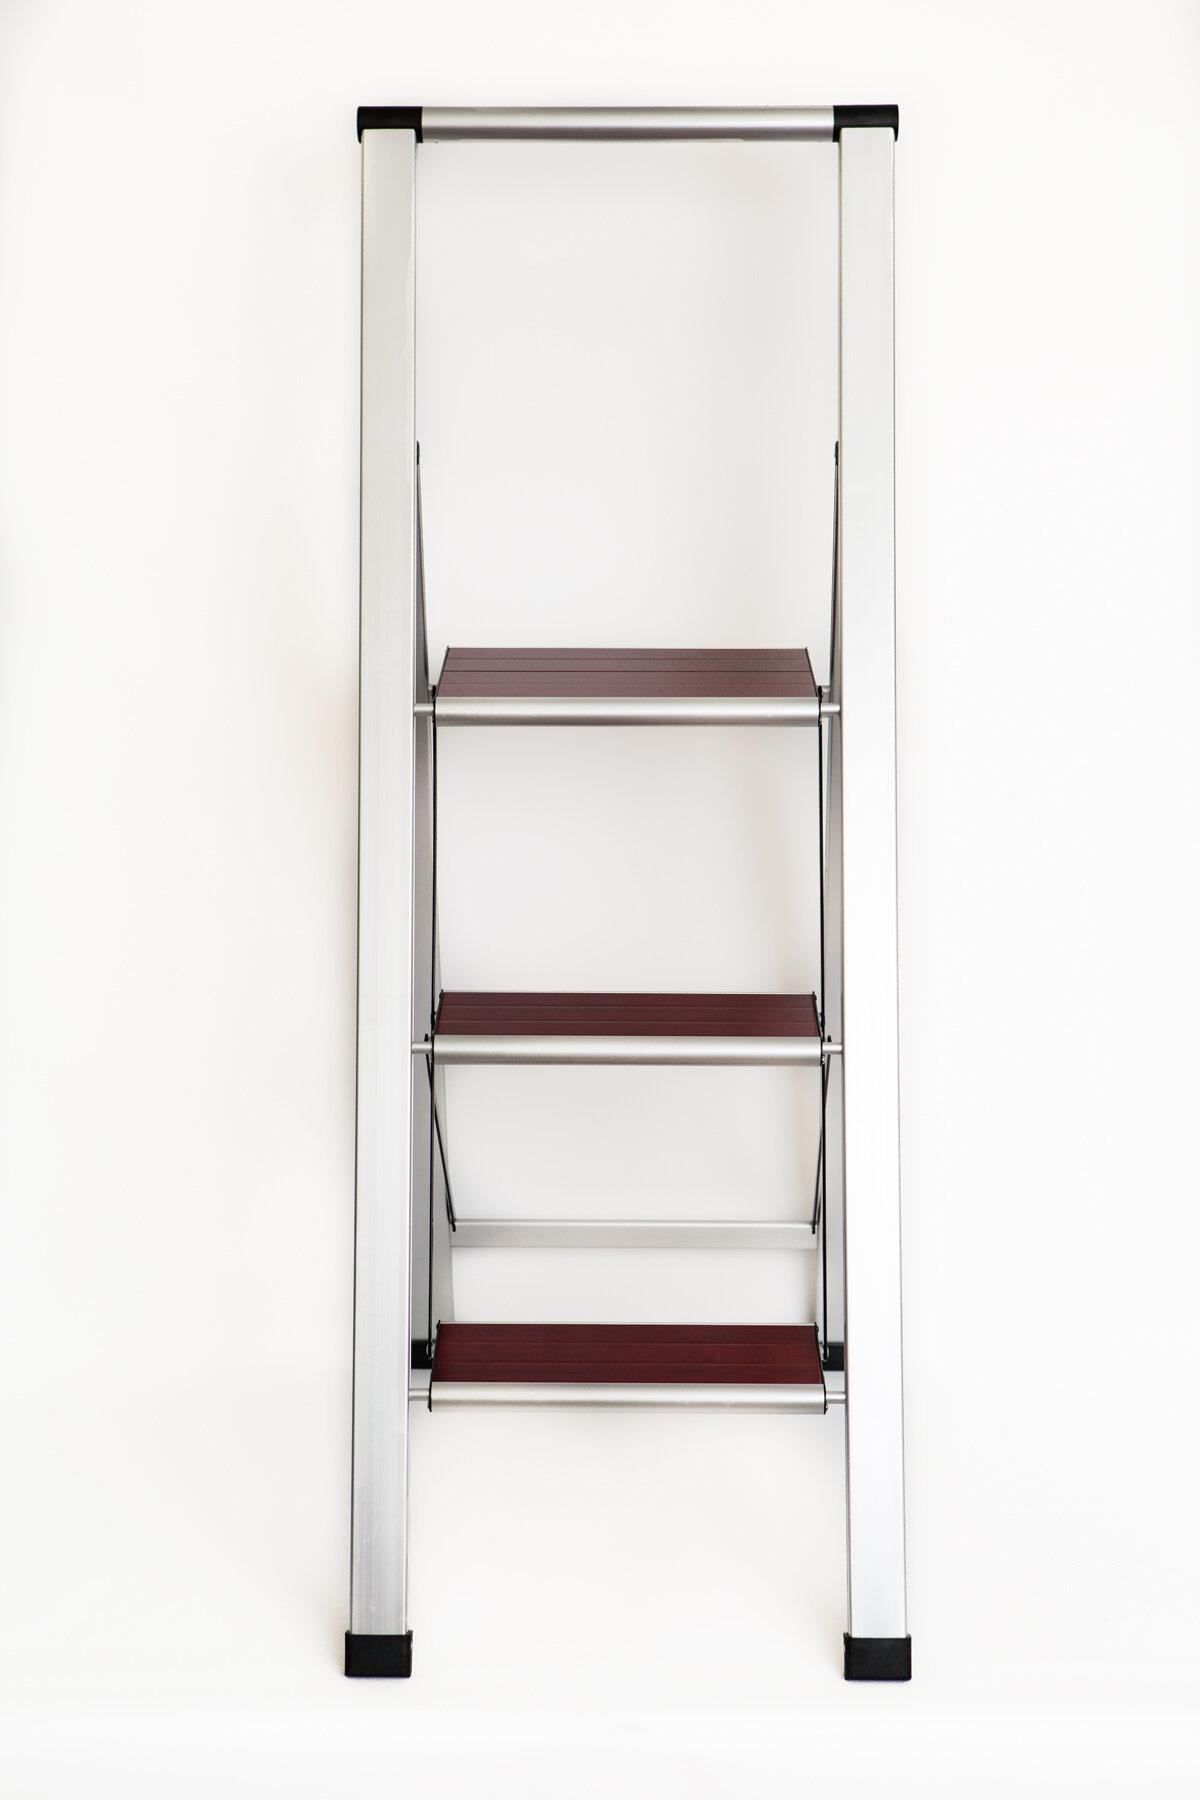 Super Emanuel Folding 3 Step Wood Step Stool With 250 Lb Load Capacity Evergreenethics Interior Chair Design Evergreenethicsorg